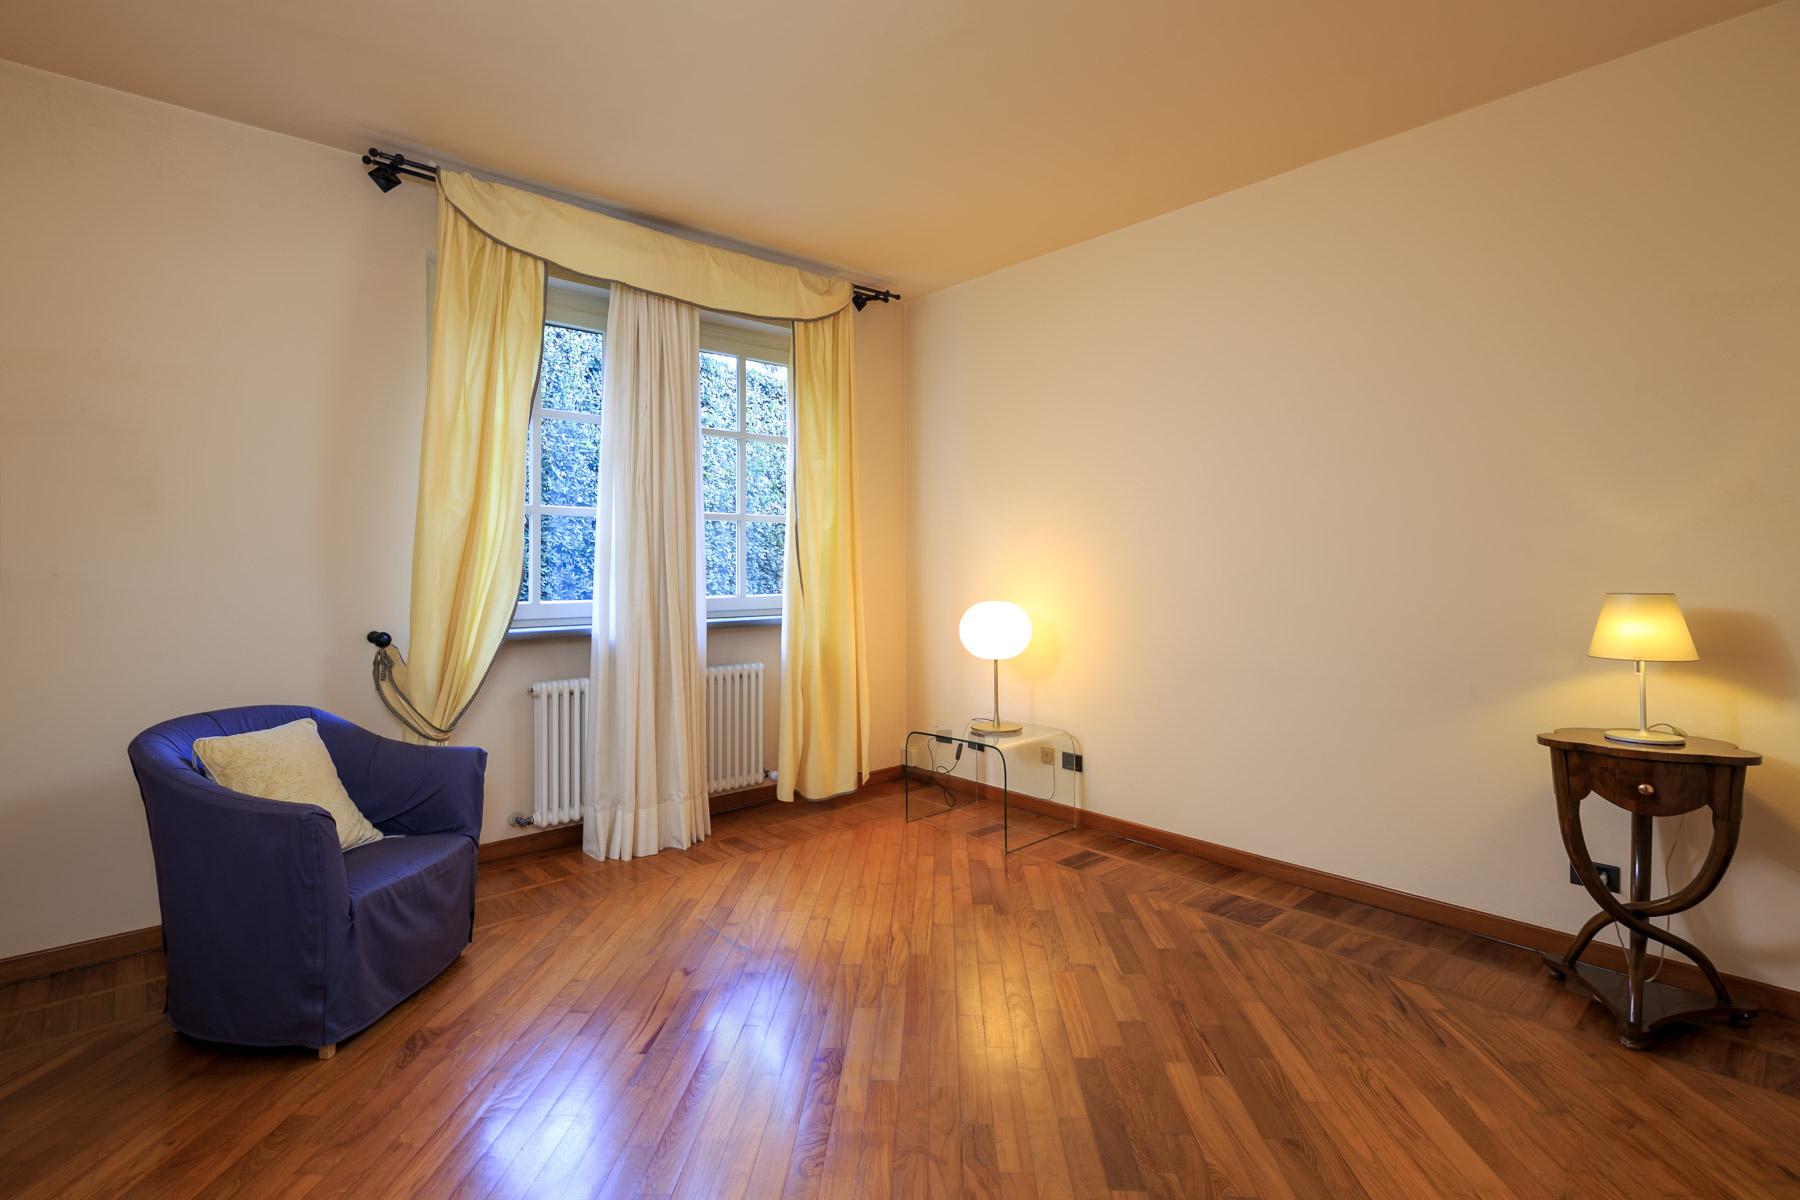 Villa in Vendita a Lucca: 5 locali, 500 mq - Foto 10